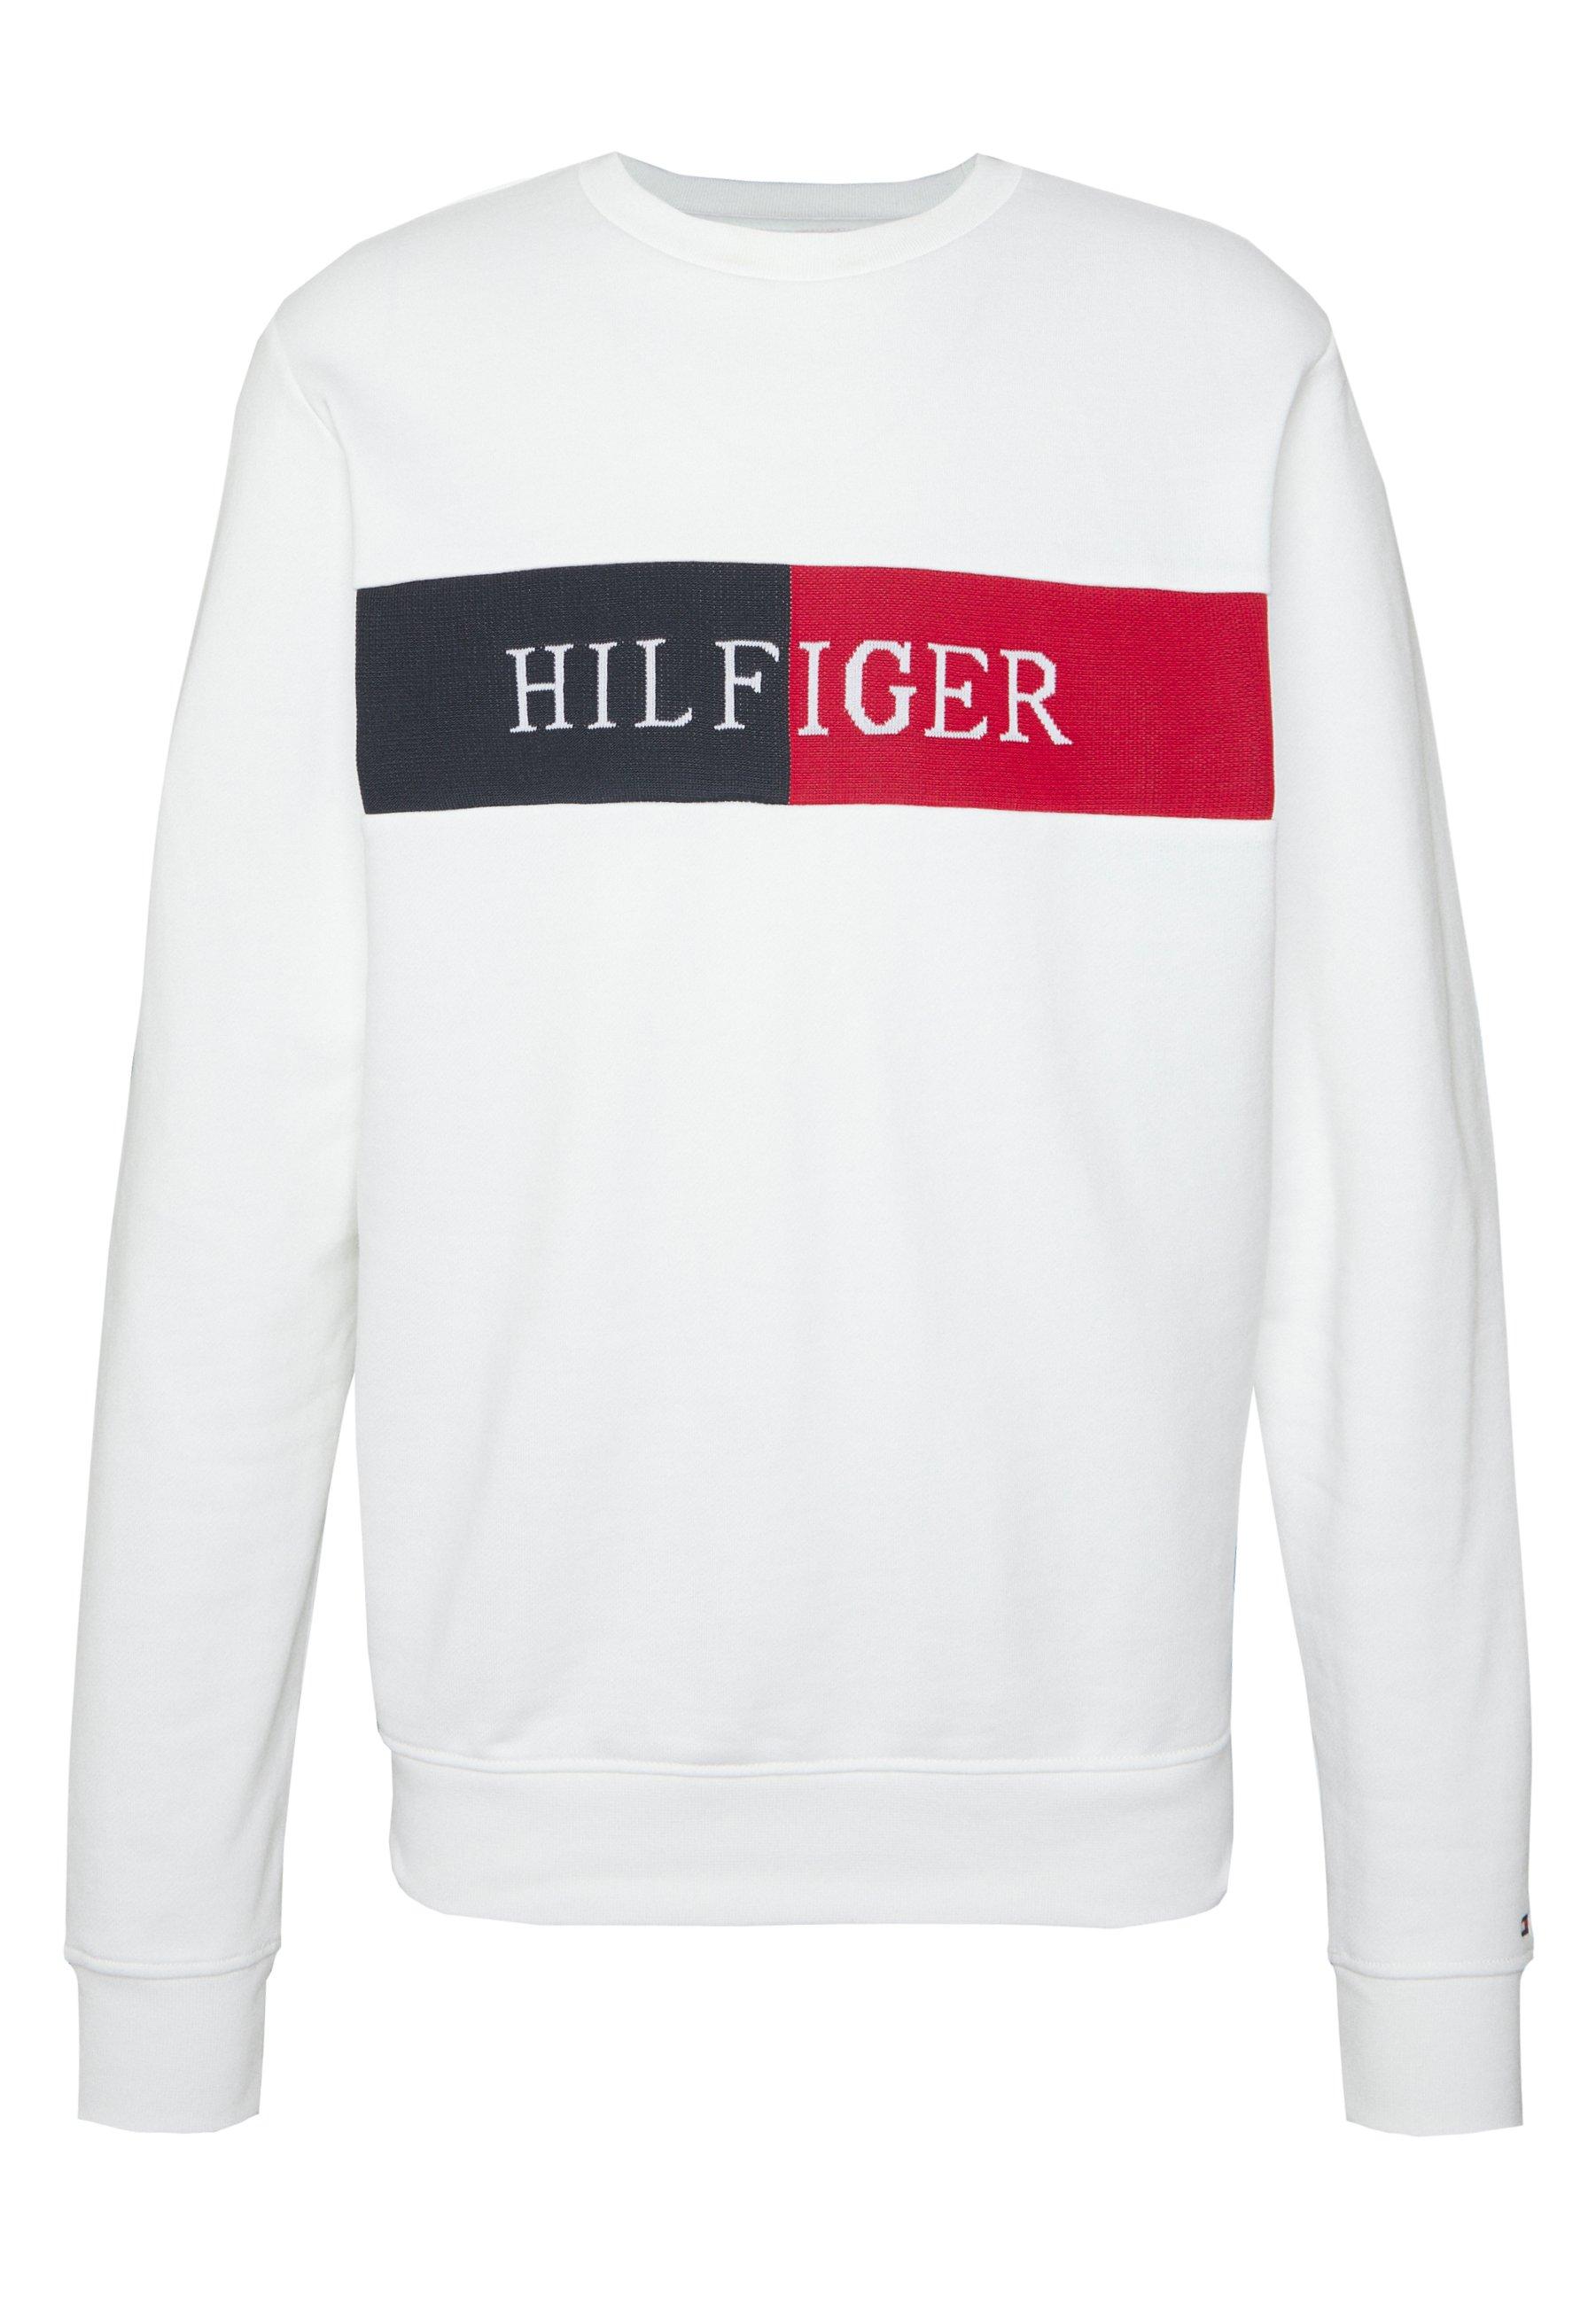 Tommy Hilfiger Intarsia - Sweatshirt White t9eE7W1u zs